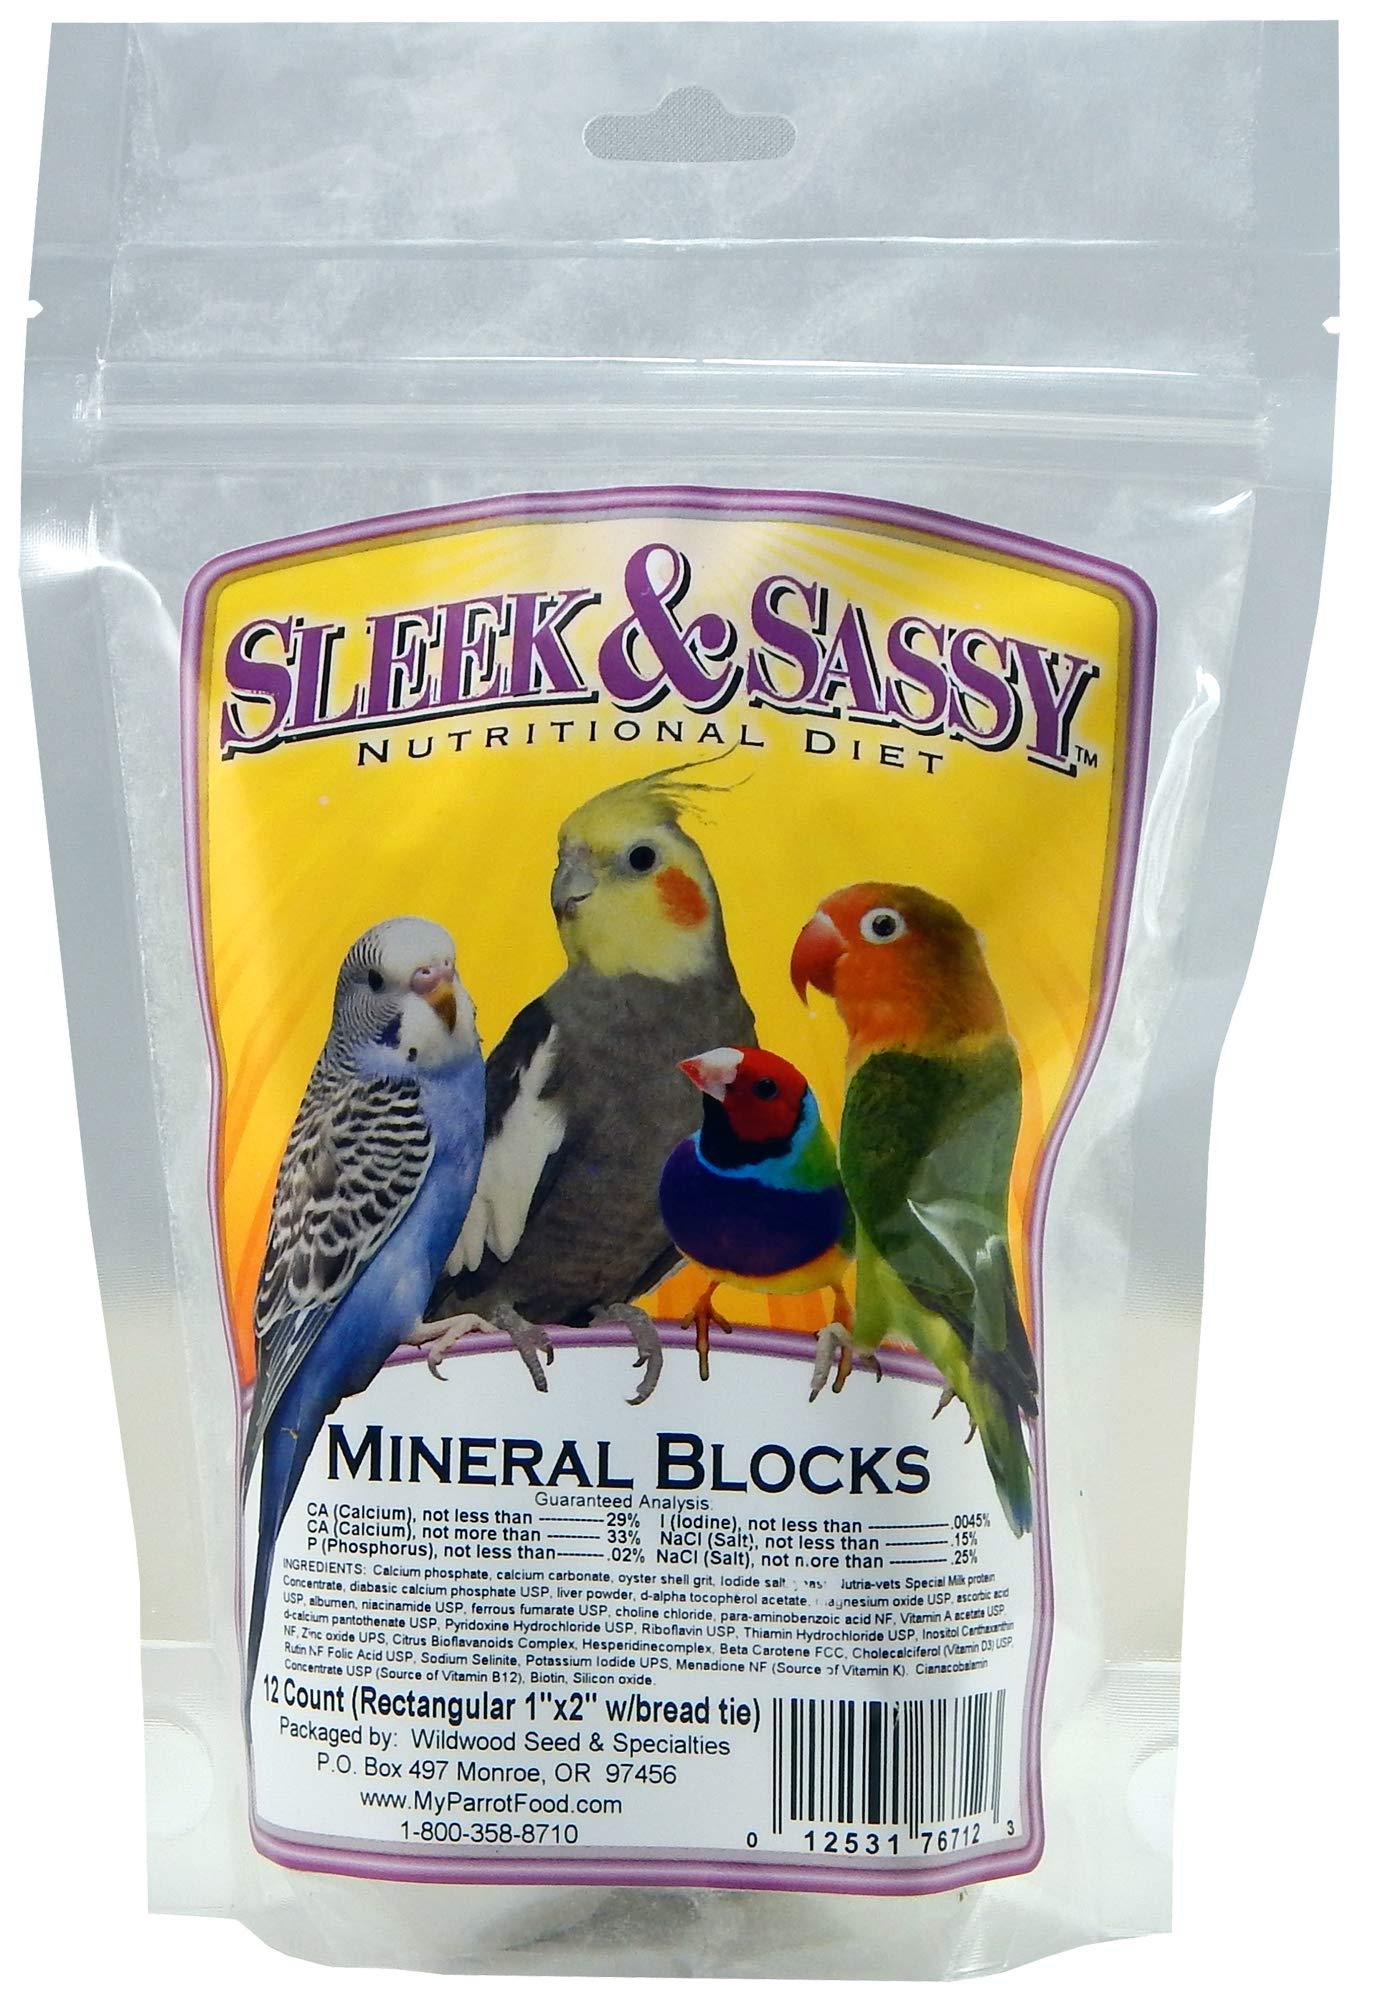 SLEEK & SASSY NUTRITIONAL DIET Mineral Blocks (1''x2'') for Birds (12 Ct.) by SLEEK & SASSY NUTRITIONAL DIET